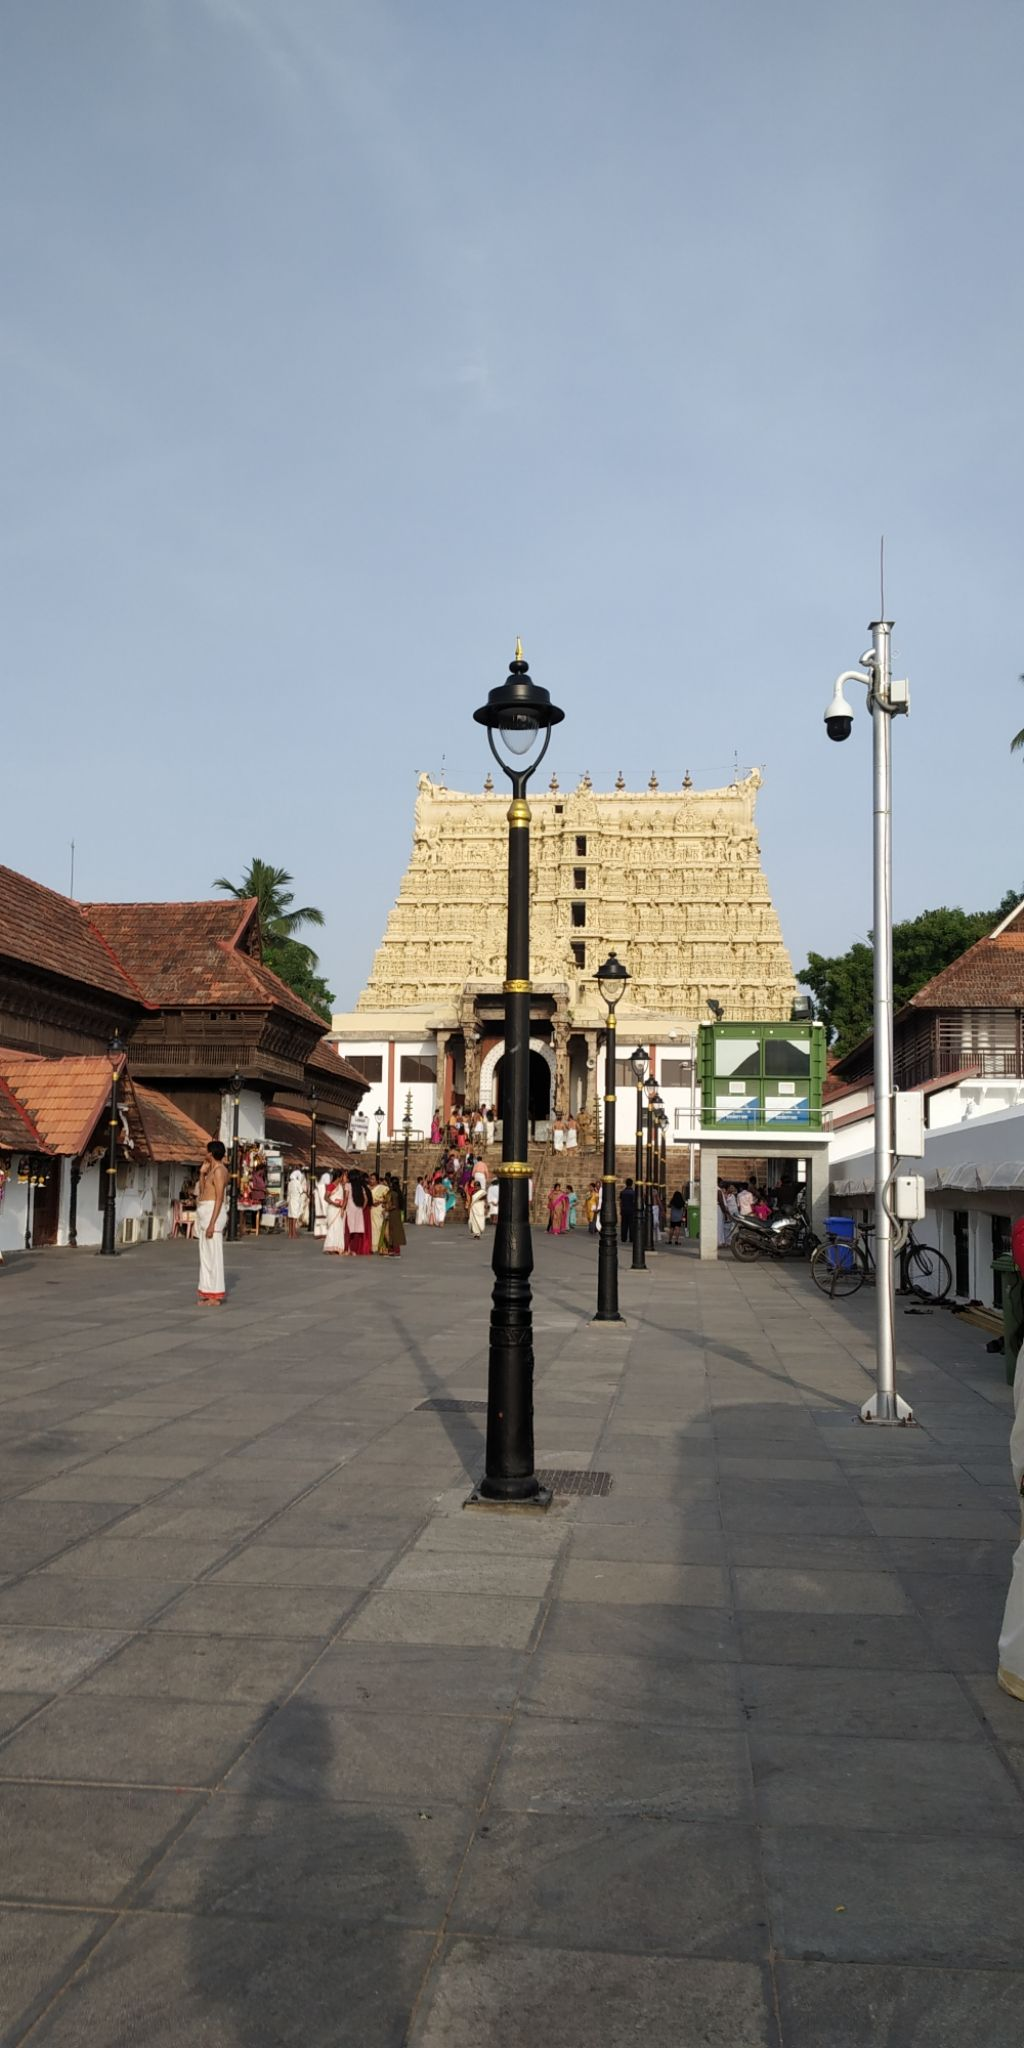 Photo of Trivandrum By Rsc sai chandra